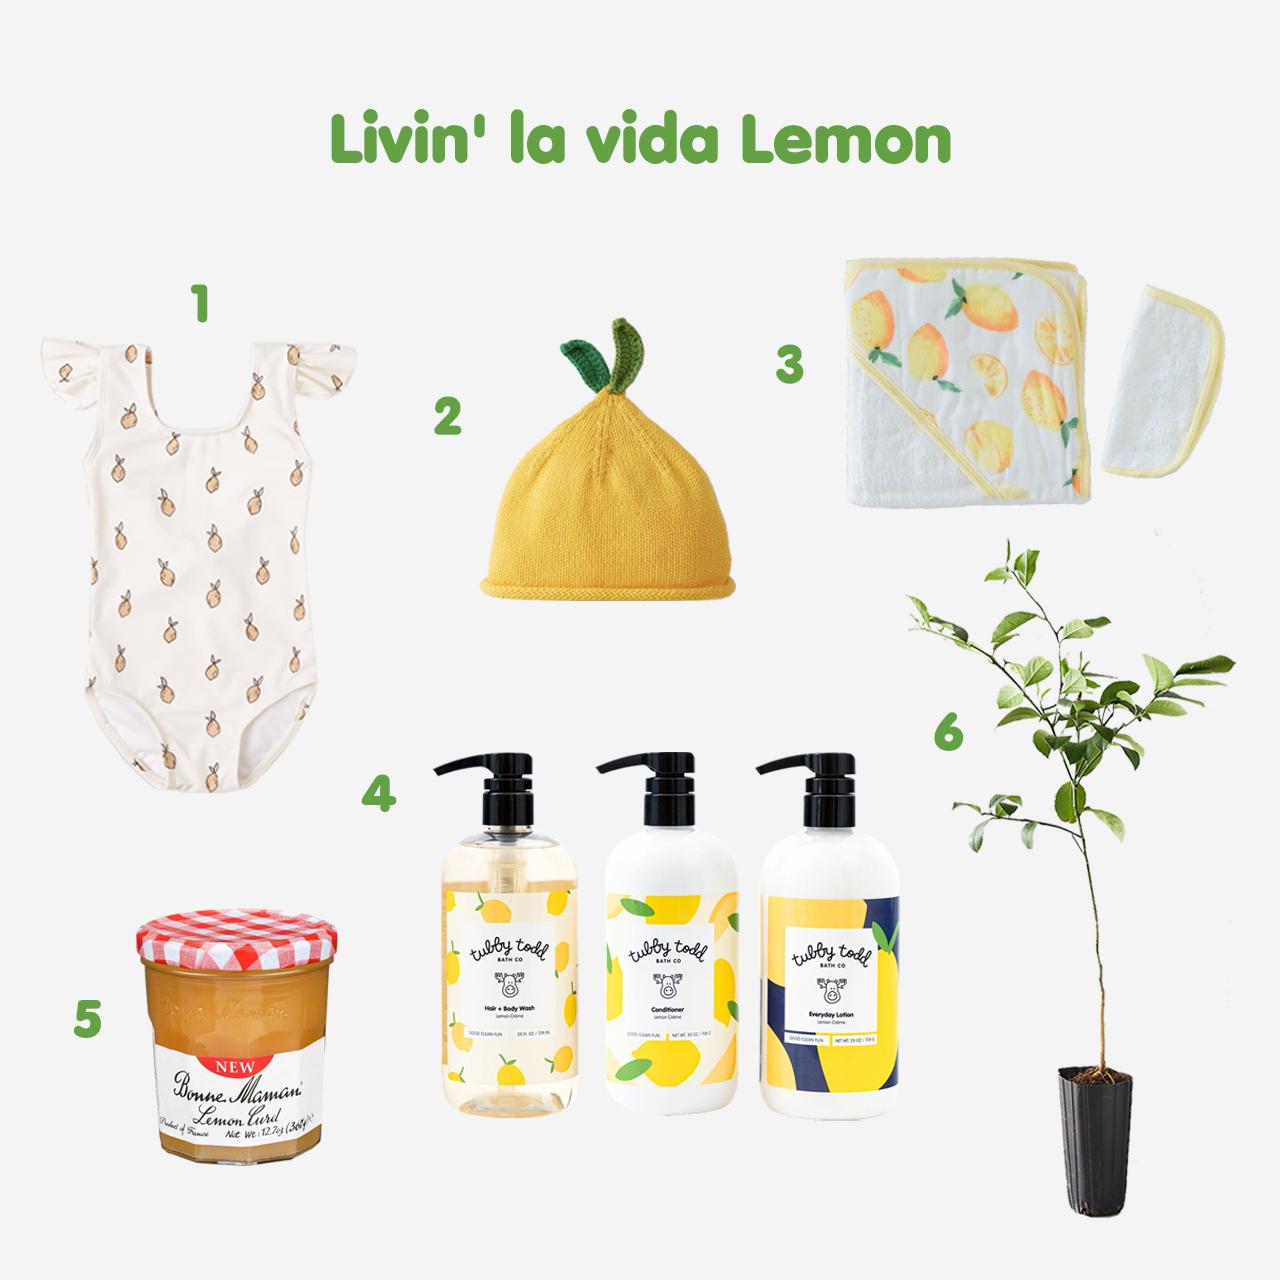 6 Favorite Lemon Treats